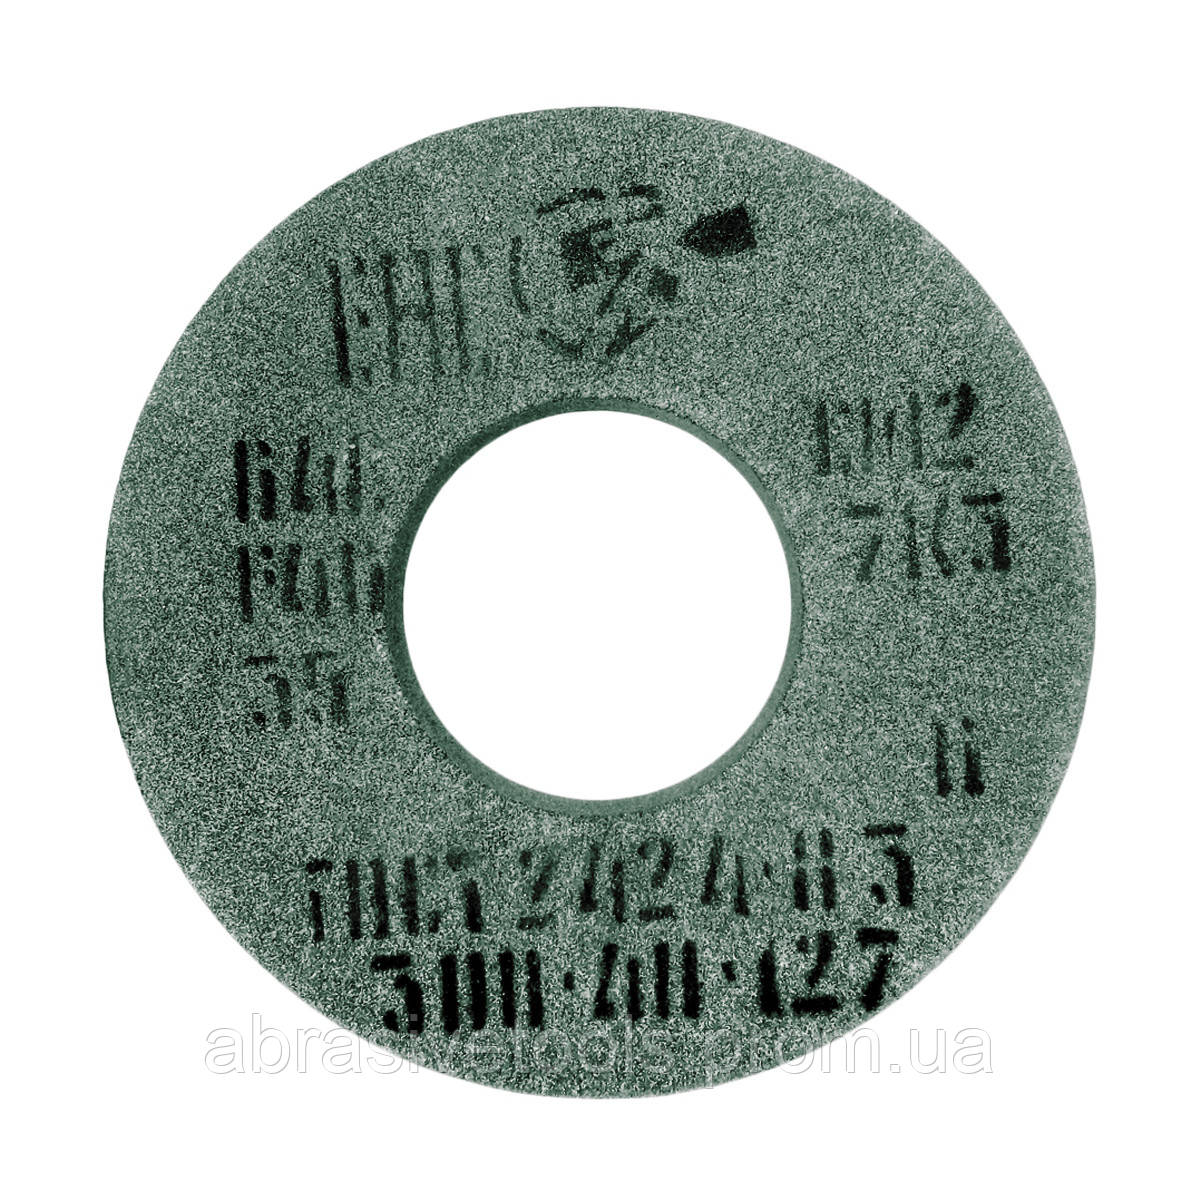 Круг шлифовальный 64С 300х40х127 F46 CT